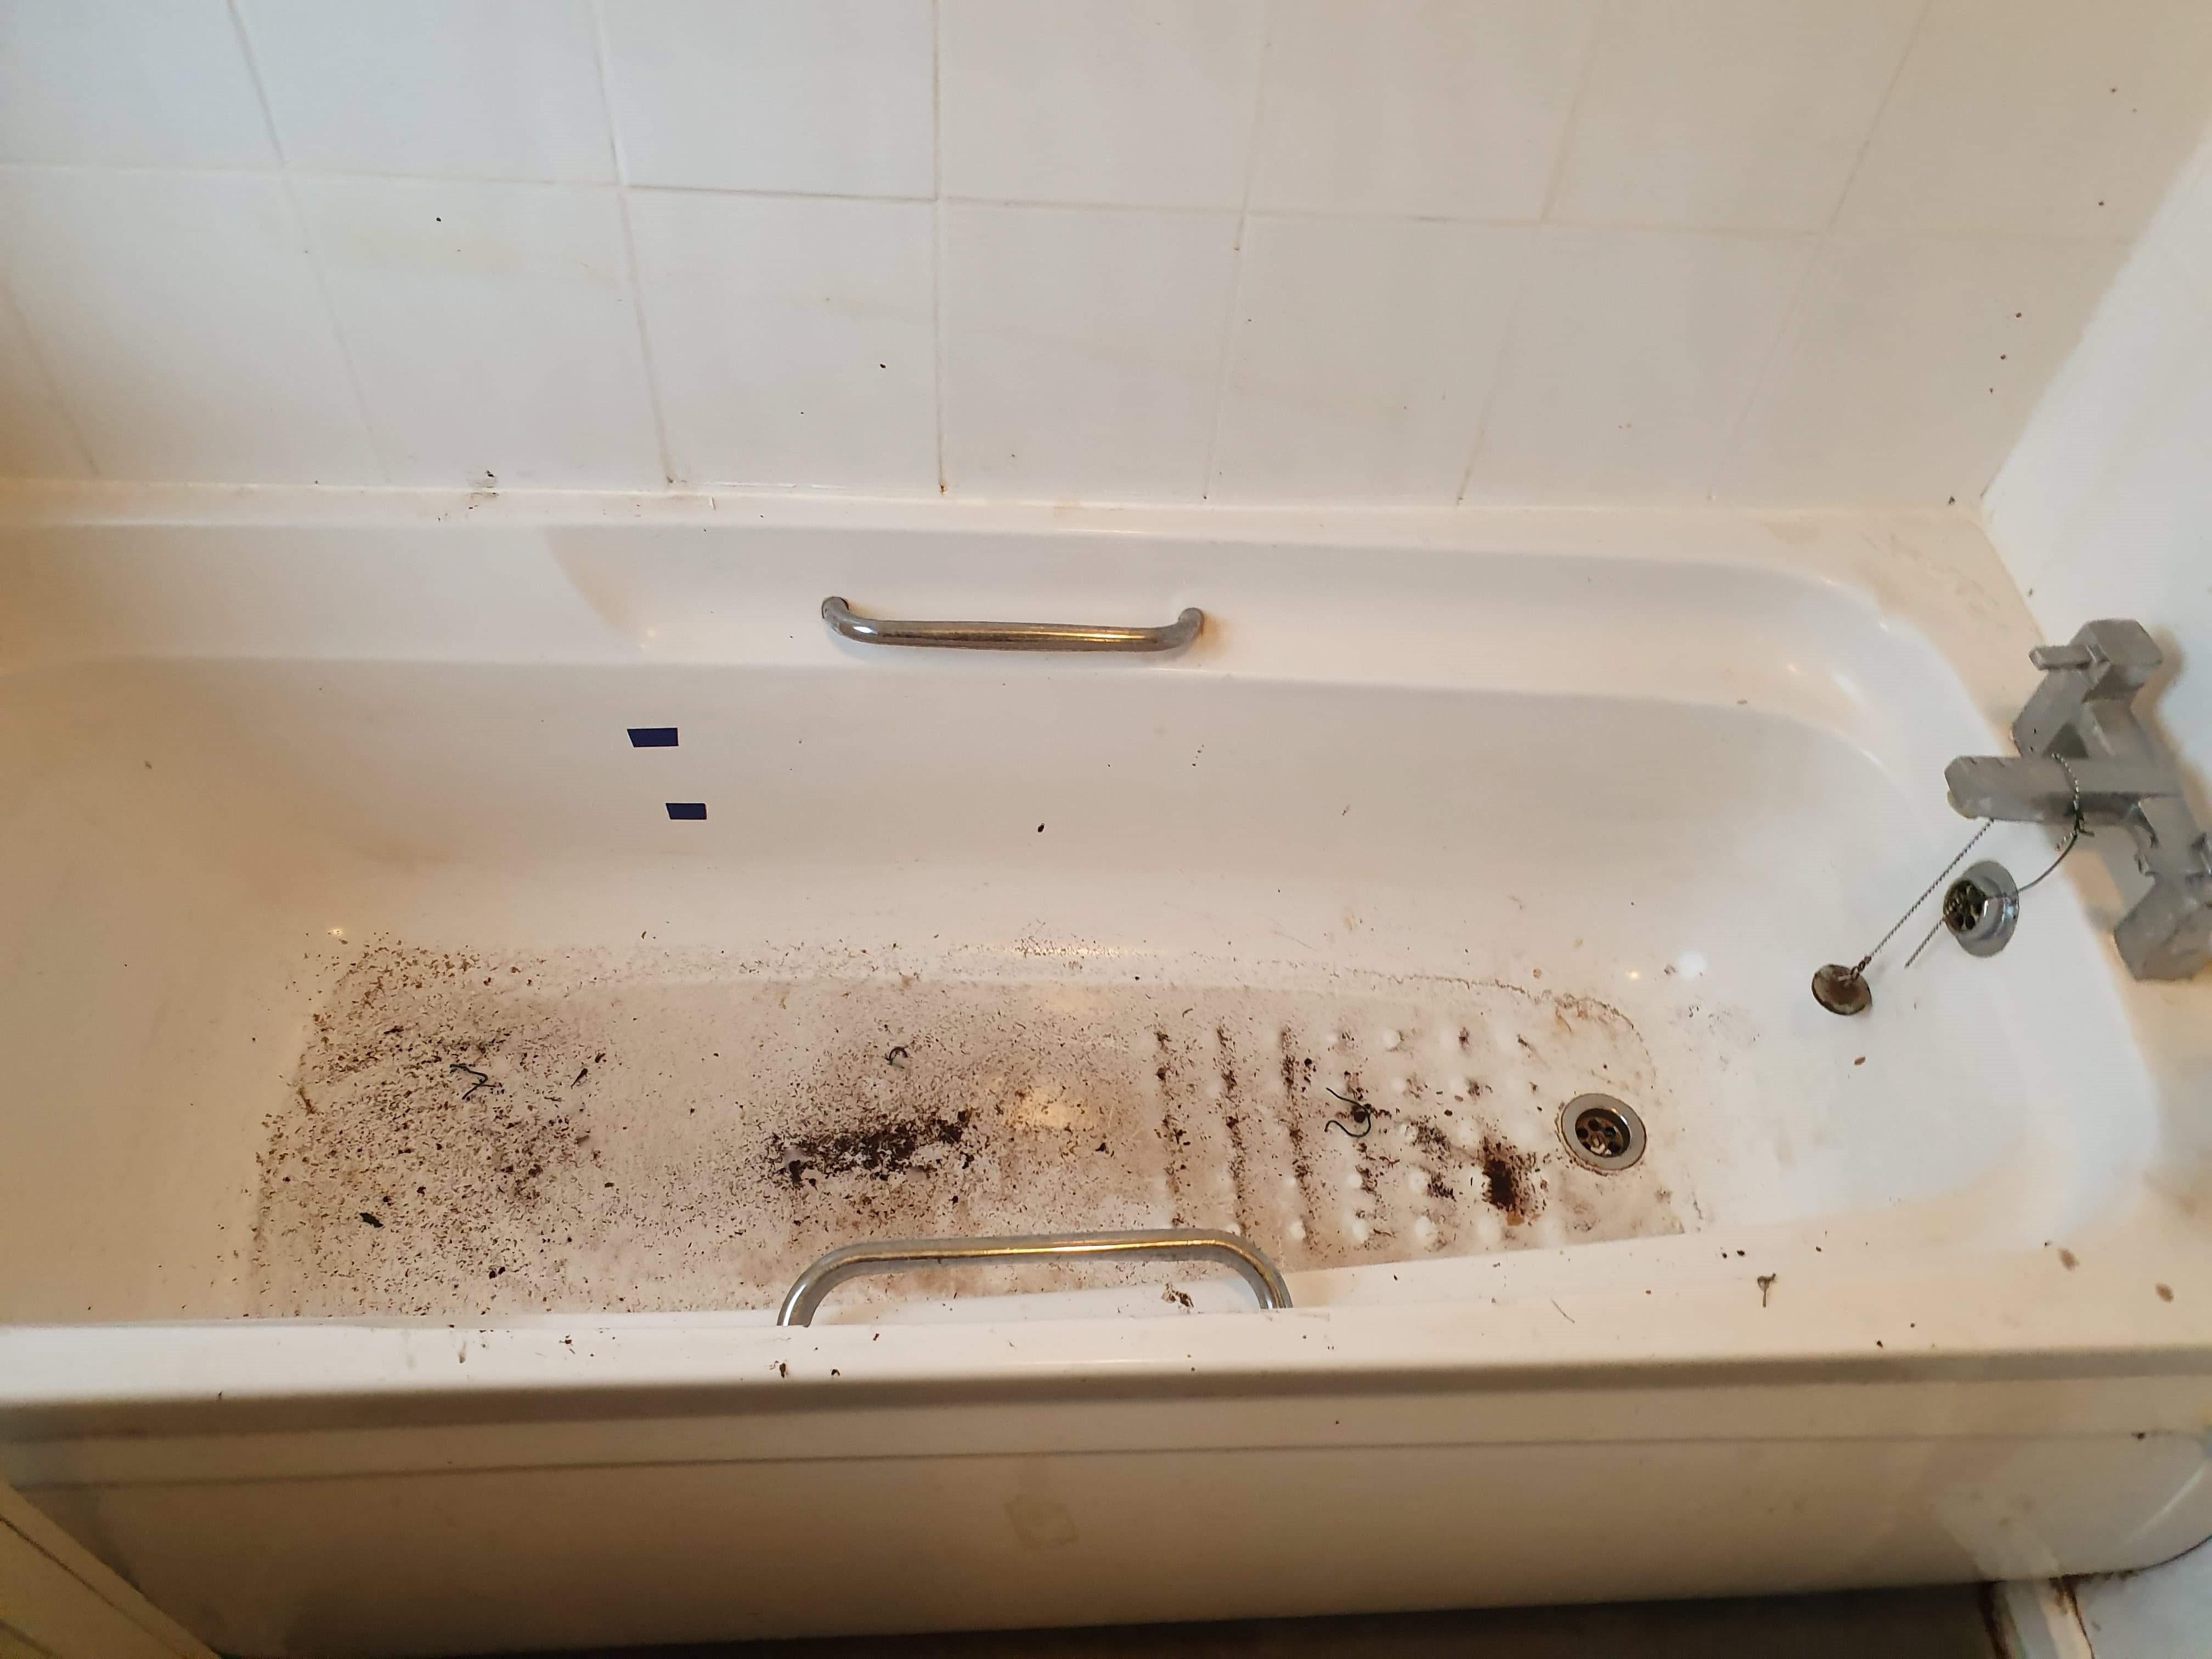 Bath tub before GForce intervention